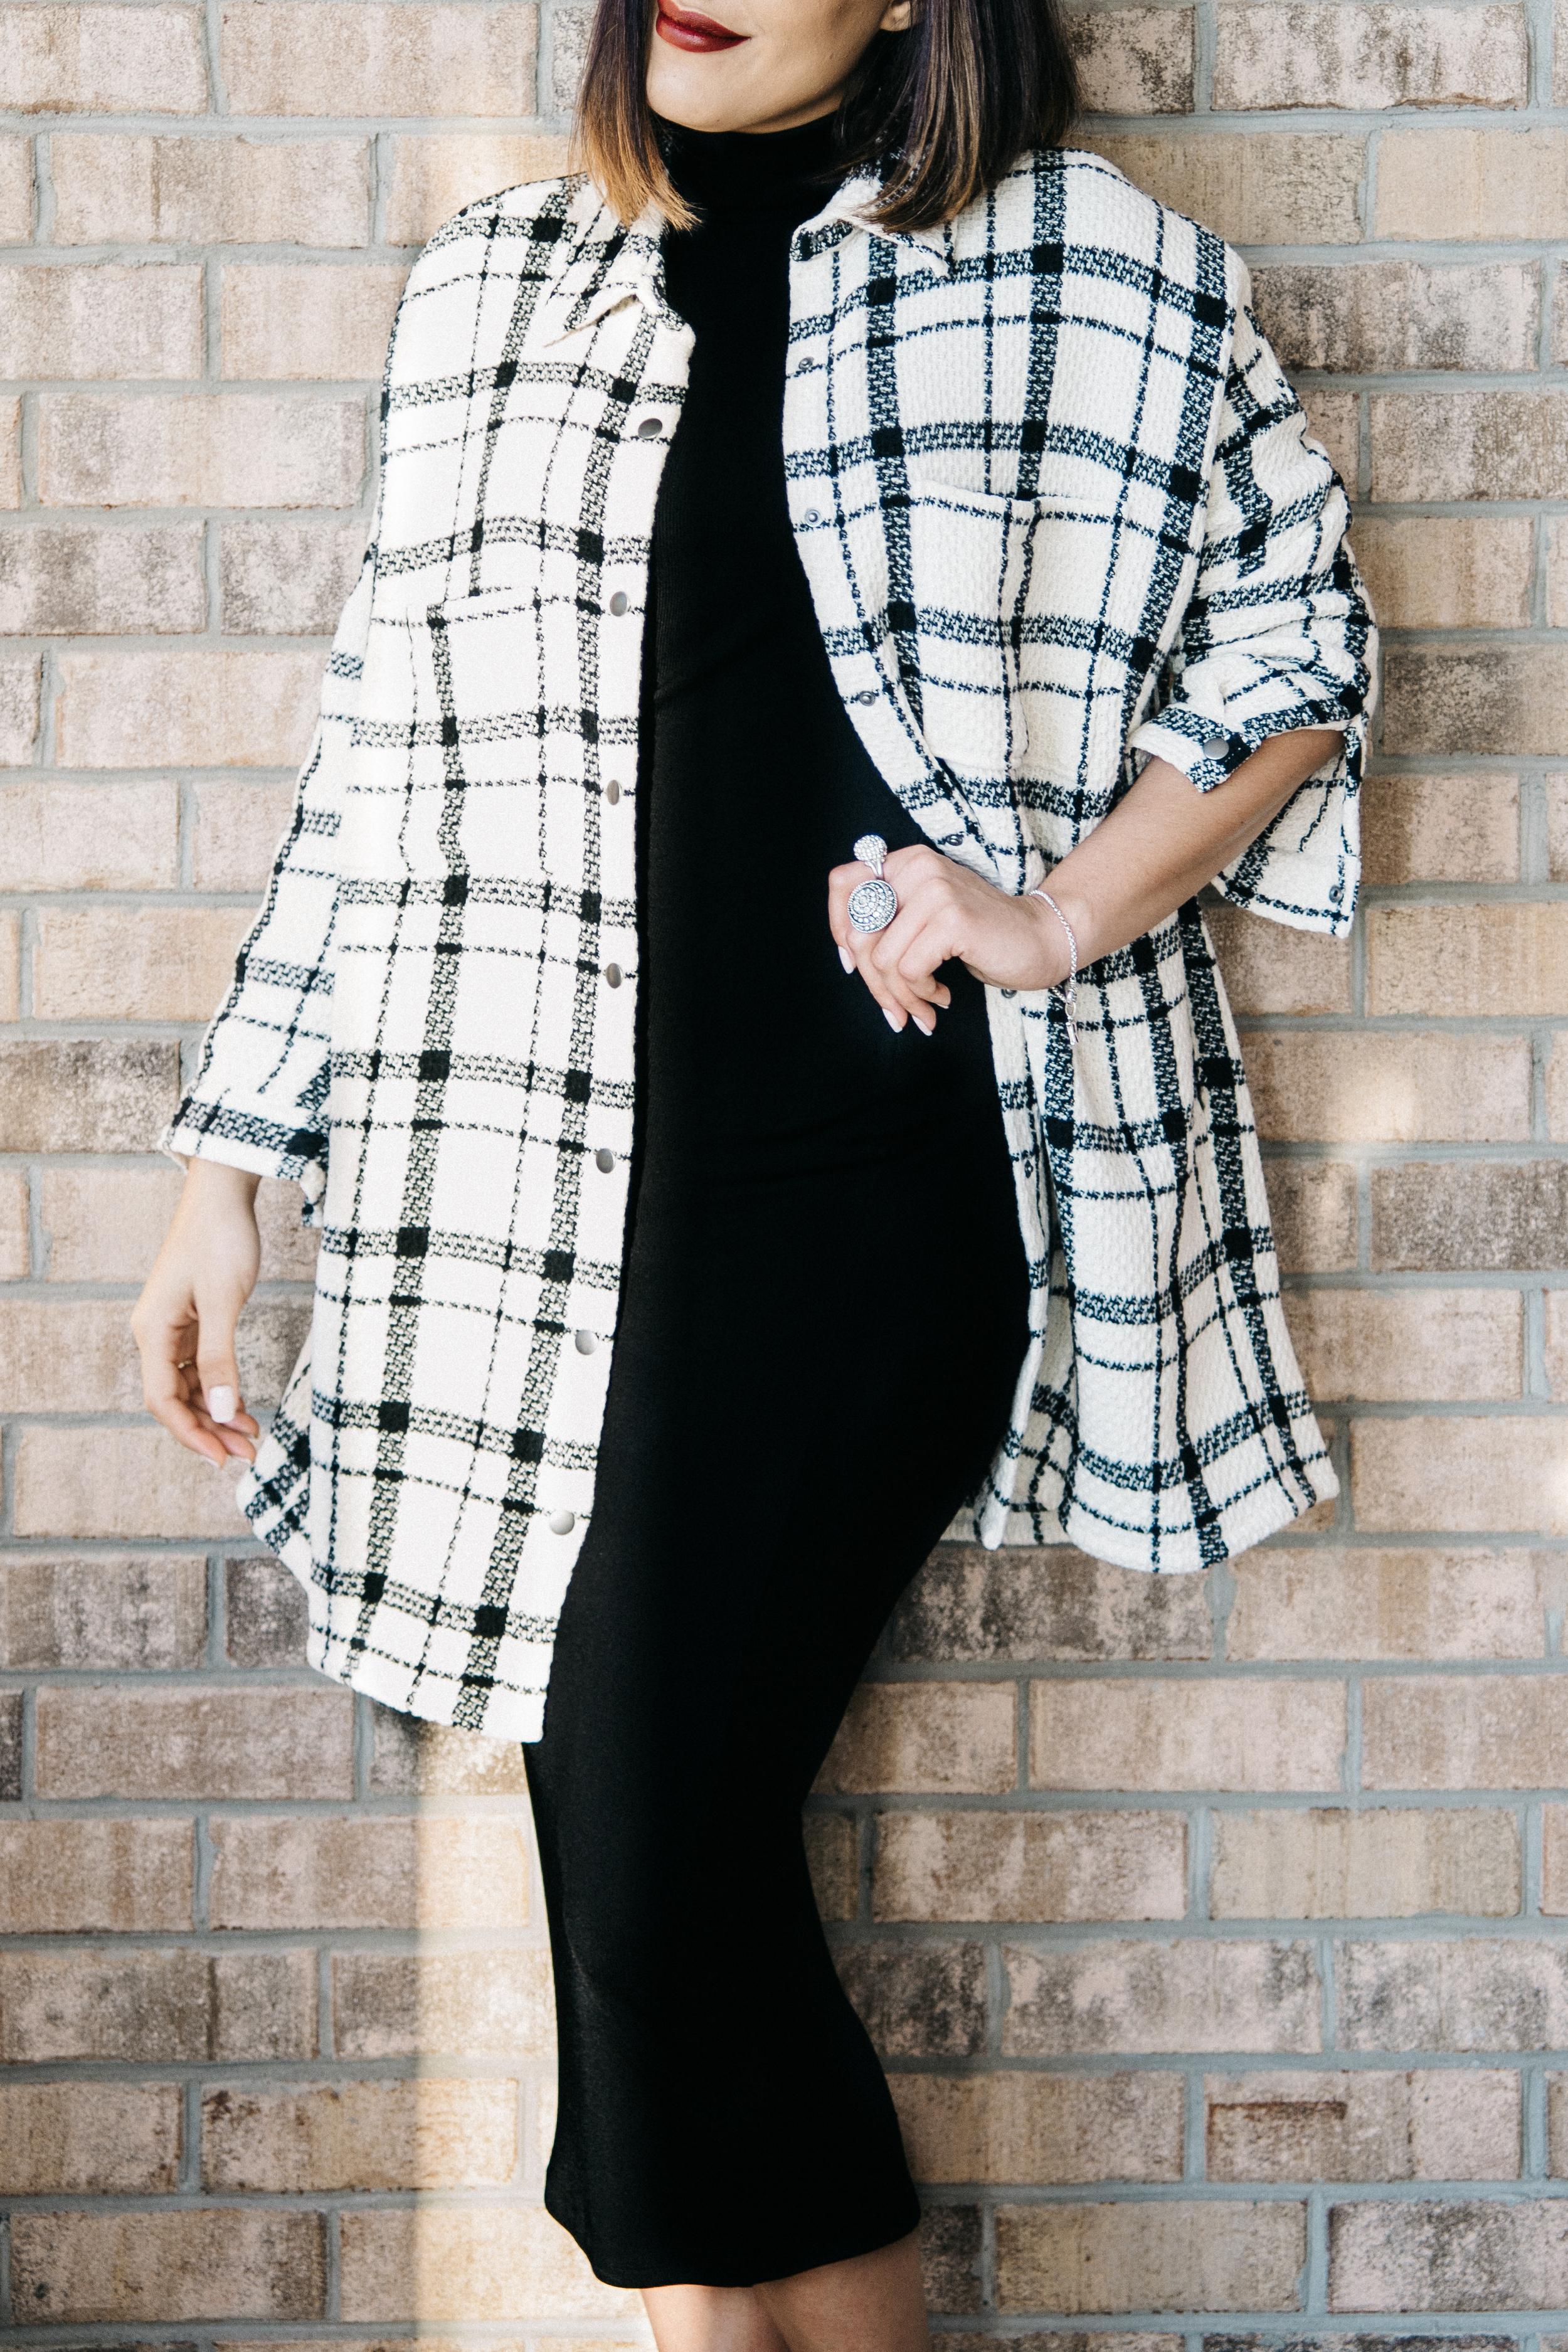 how-to-wear-turtleneck-dress-and-oversize-shirt-jacket.jpg